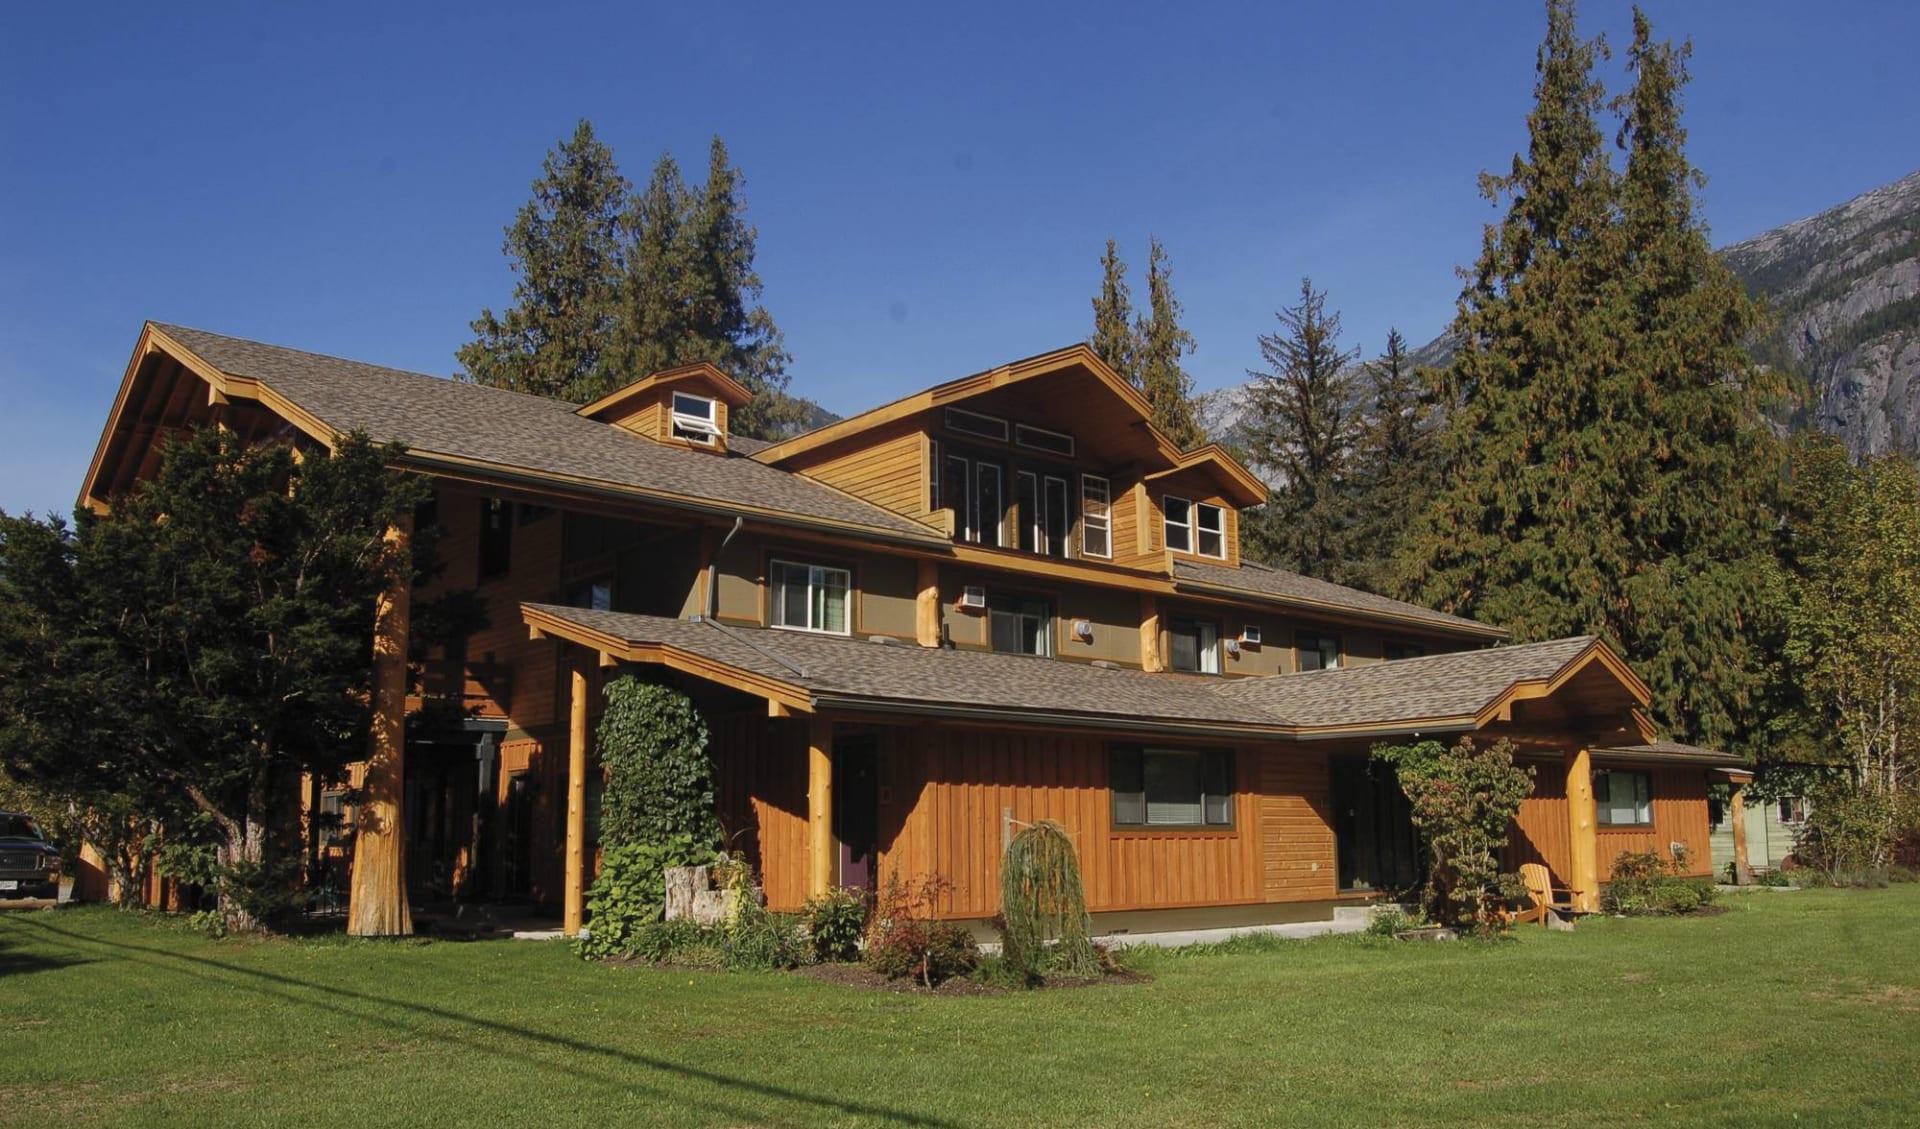 Bella Coola Mountain Lodge: _Bella Coola Mountain Lodge -Aussenansicht